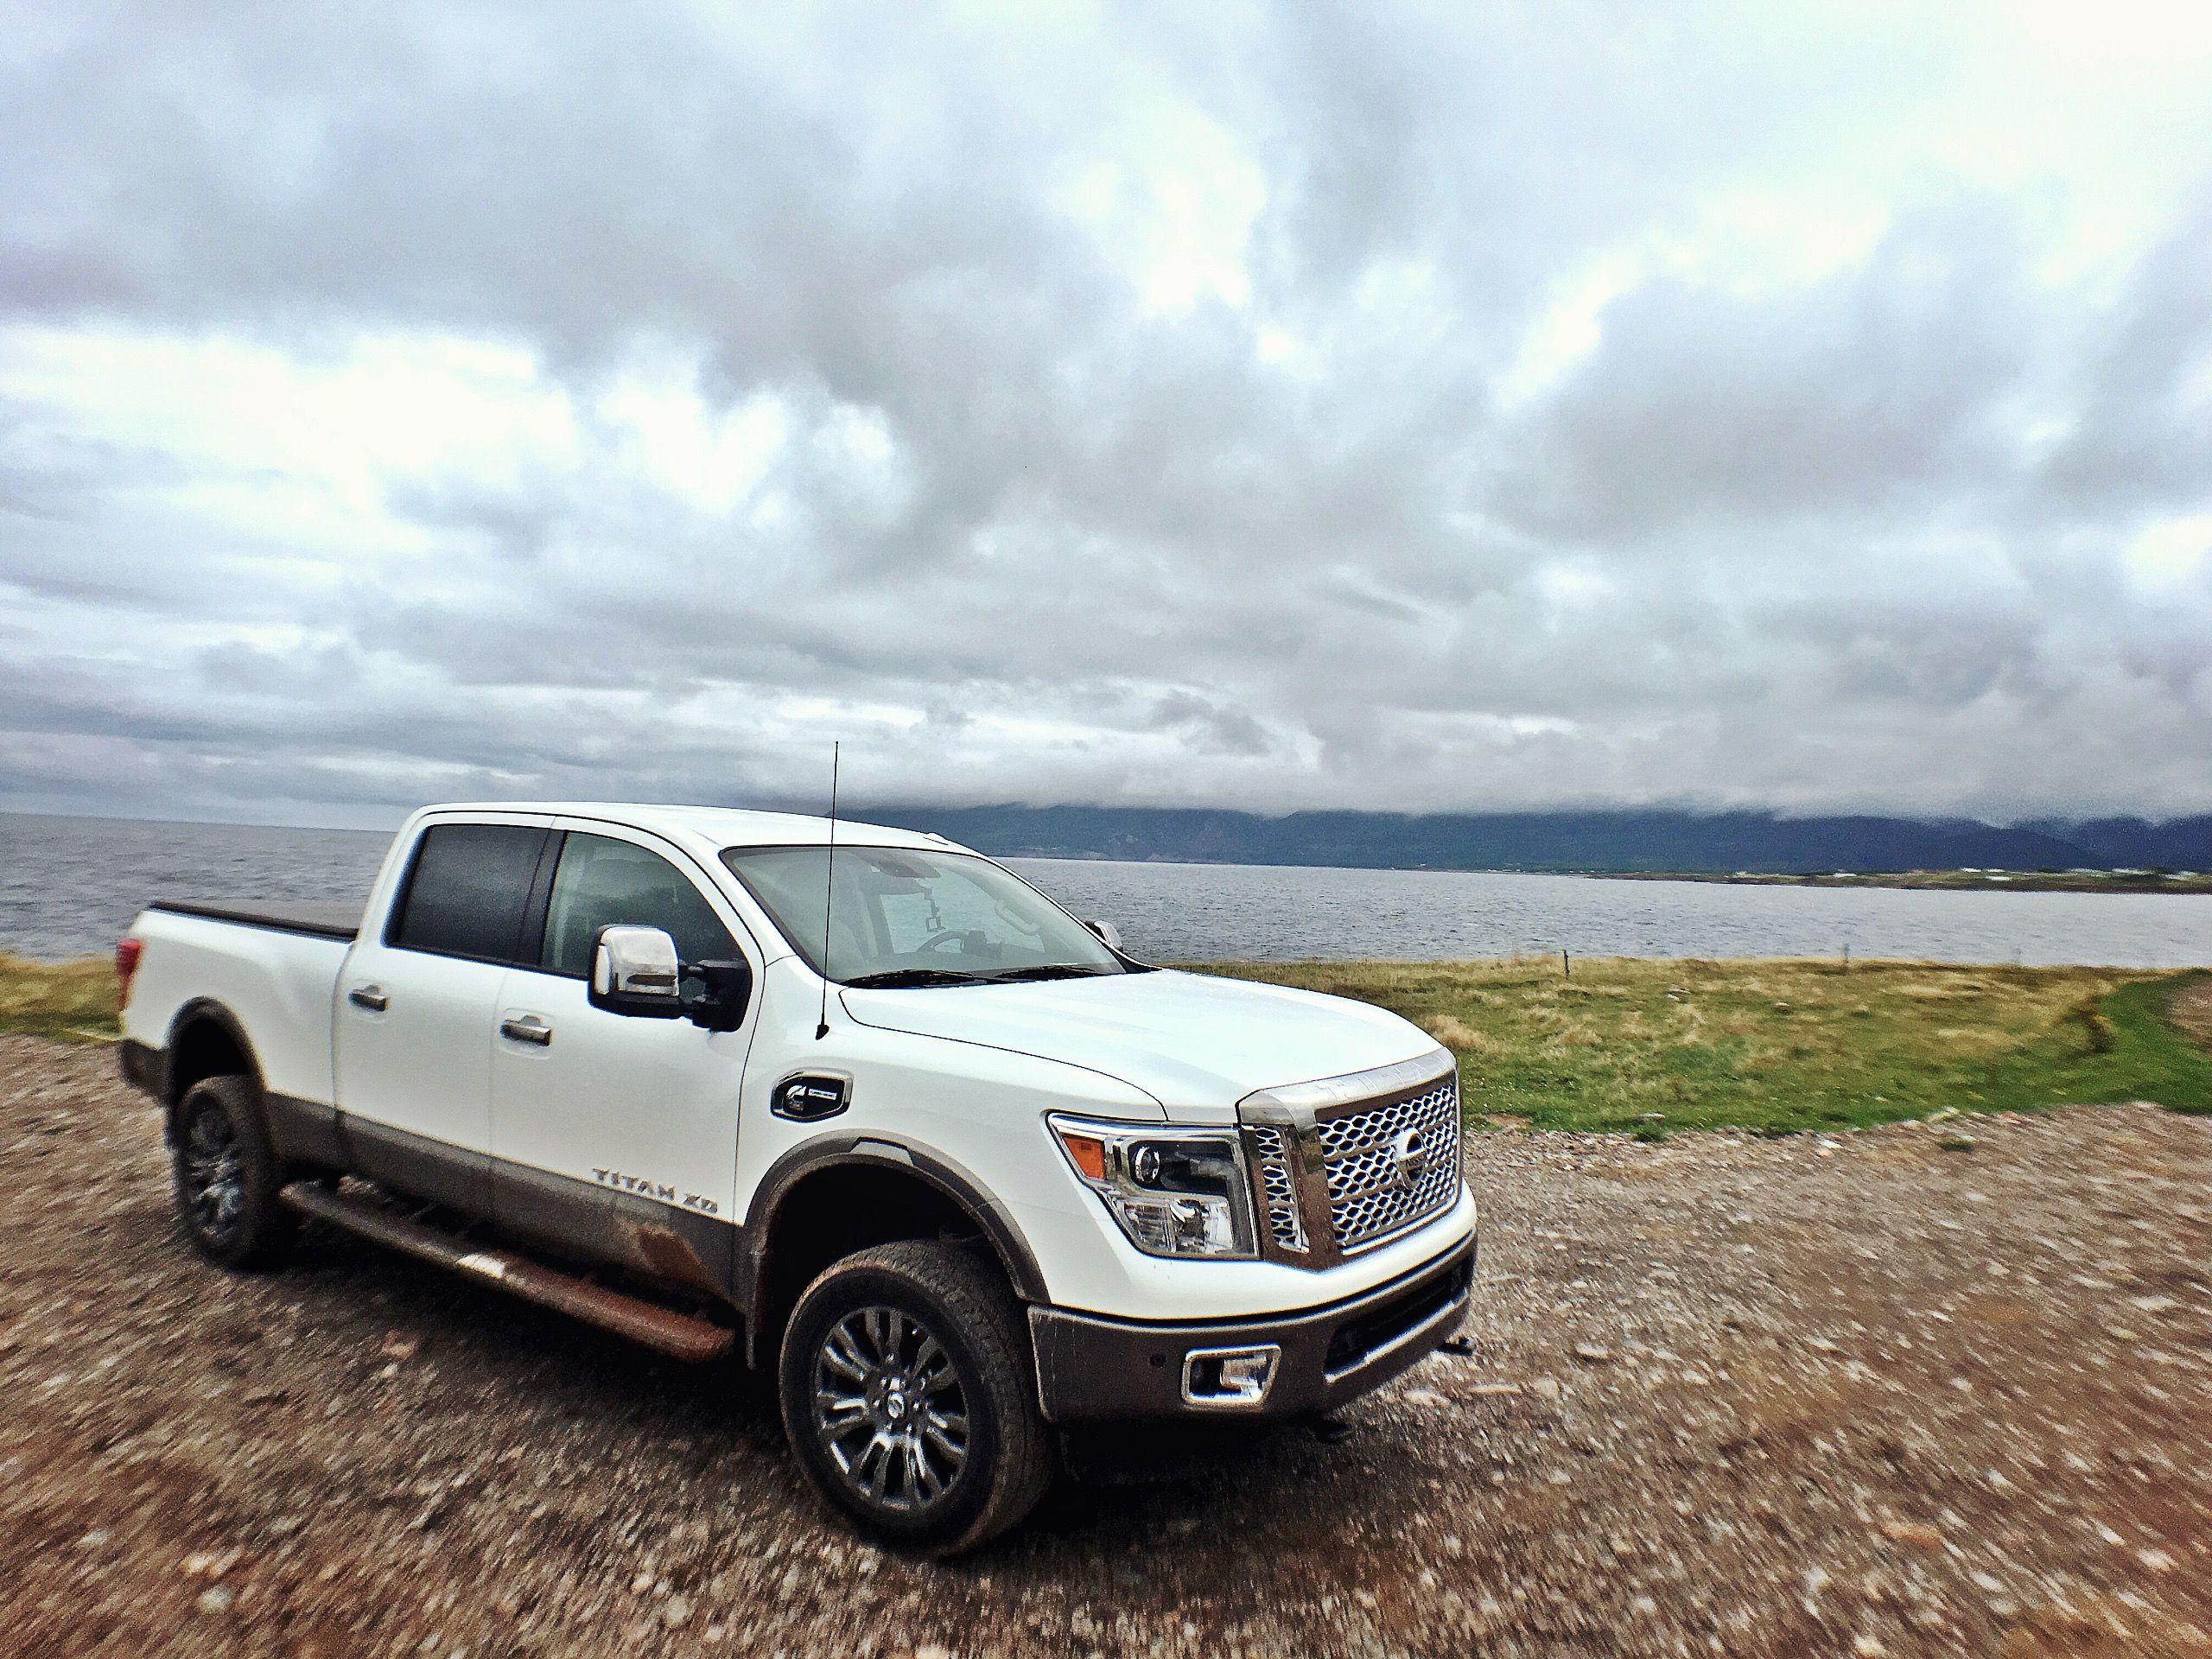 Take a back road Cape Breton Island Nissan titan, Cape